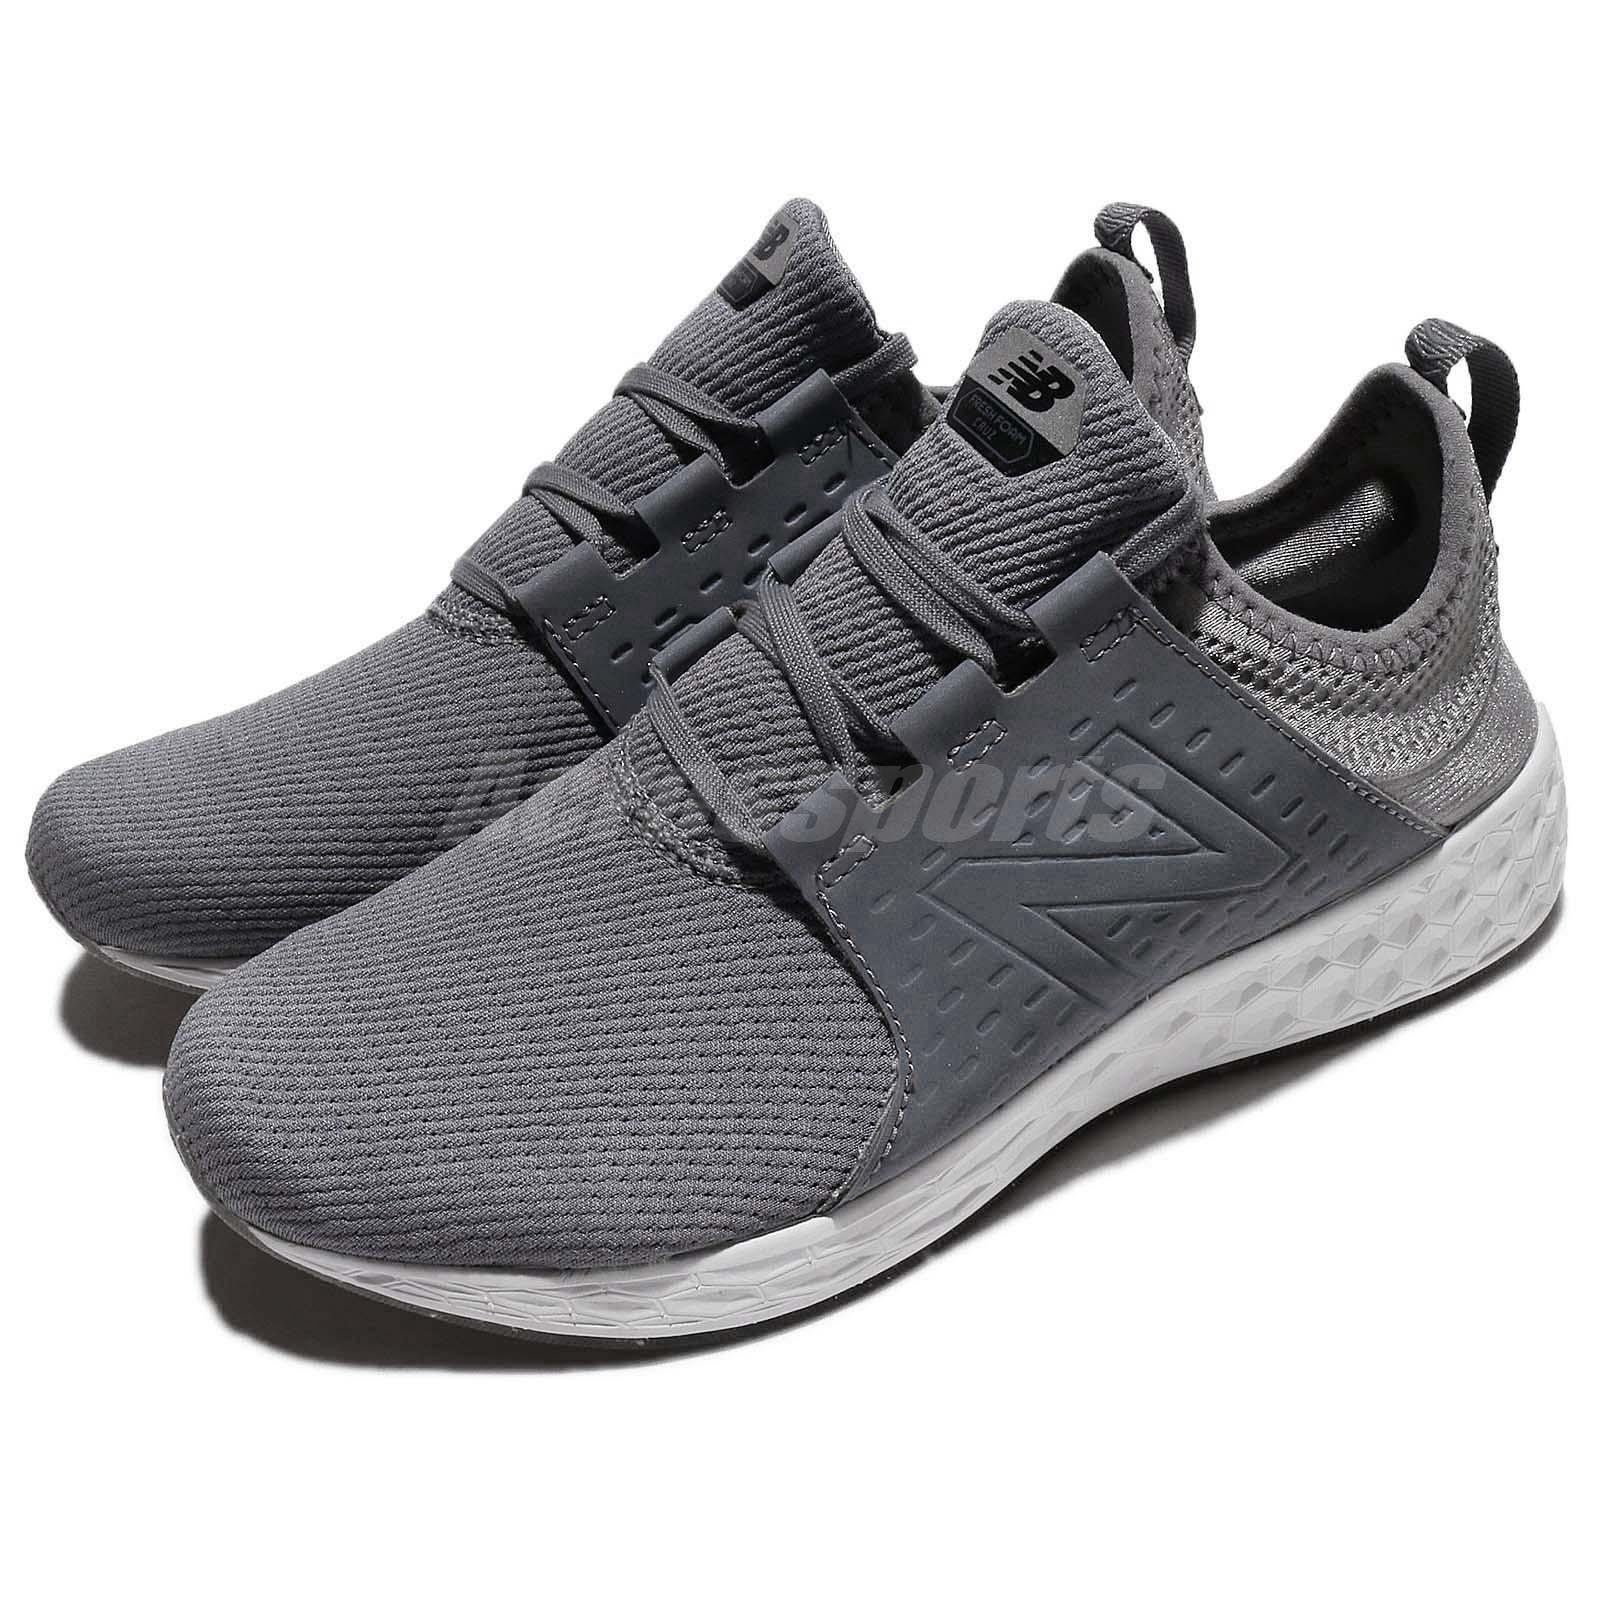 New Balance MCRUZSG D  Gris  Blanc Homme Running Chaussures Trainers Sneakers MCRUZSGD